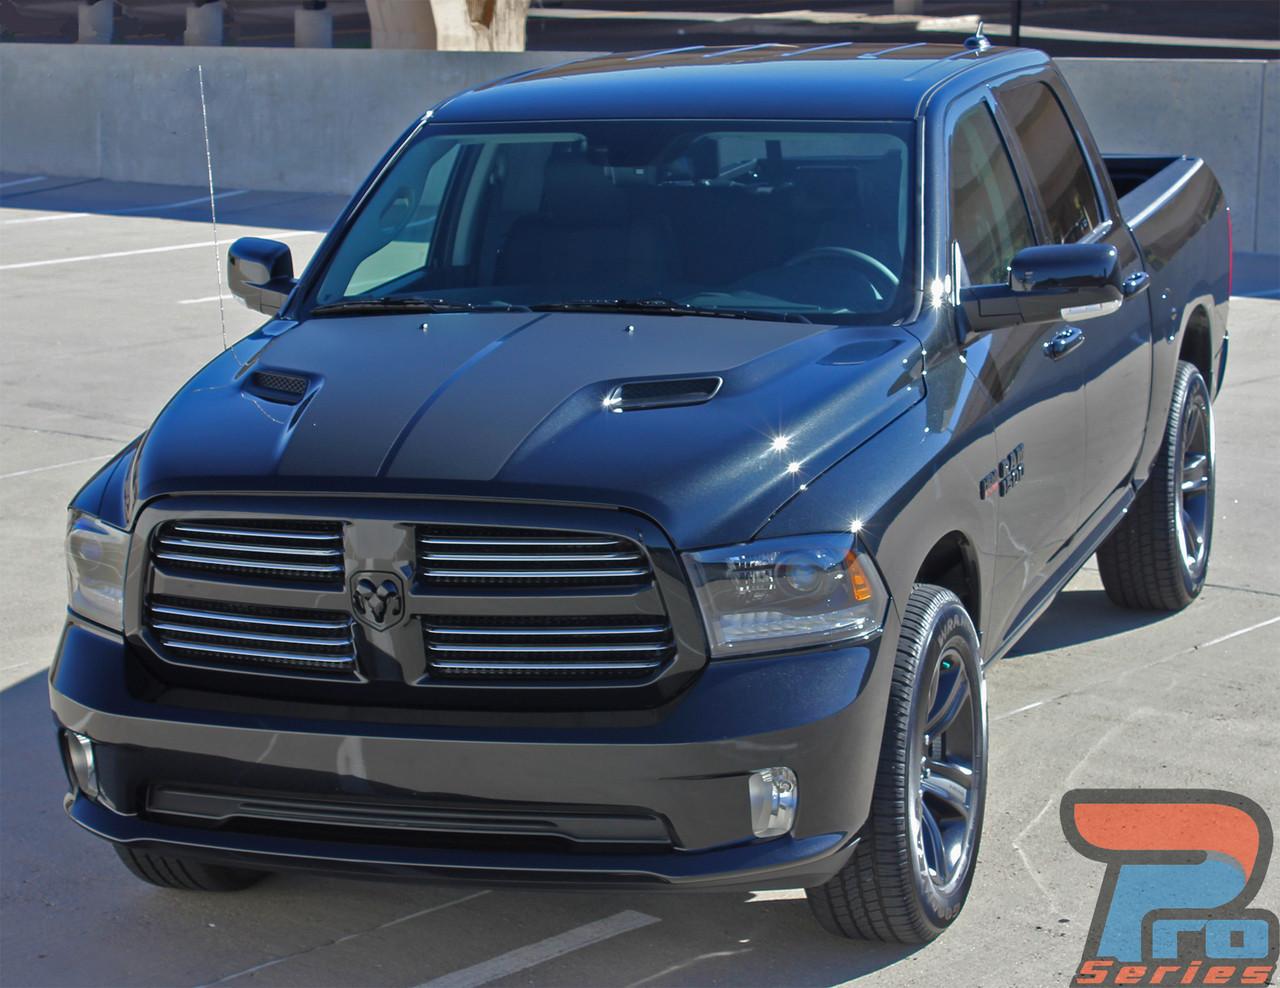 Dodge ram 1500 truck vinyl graphics decals stripes hood split accents mopar 3m 2009 2010 2011 2012 2013 204 2015 2016 2017 vgp hemi 04 81328 1550508236